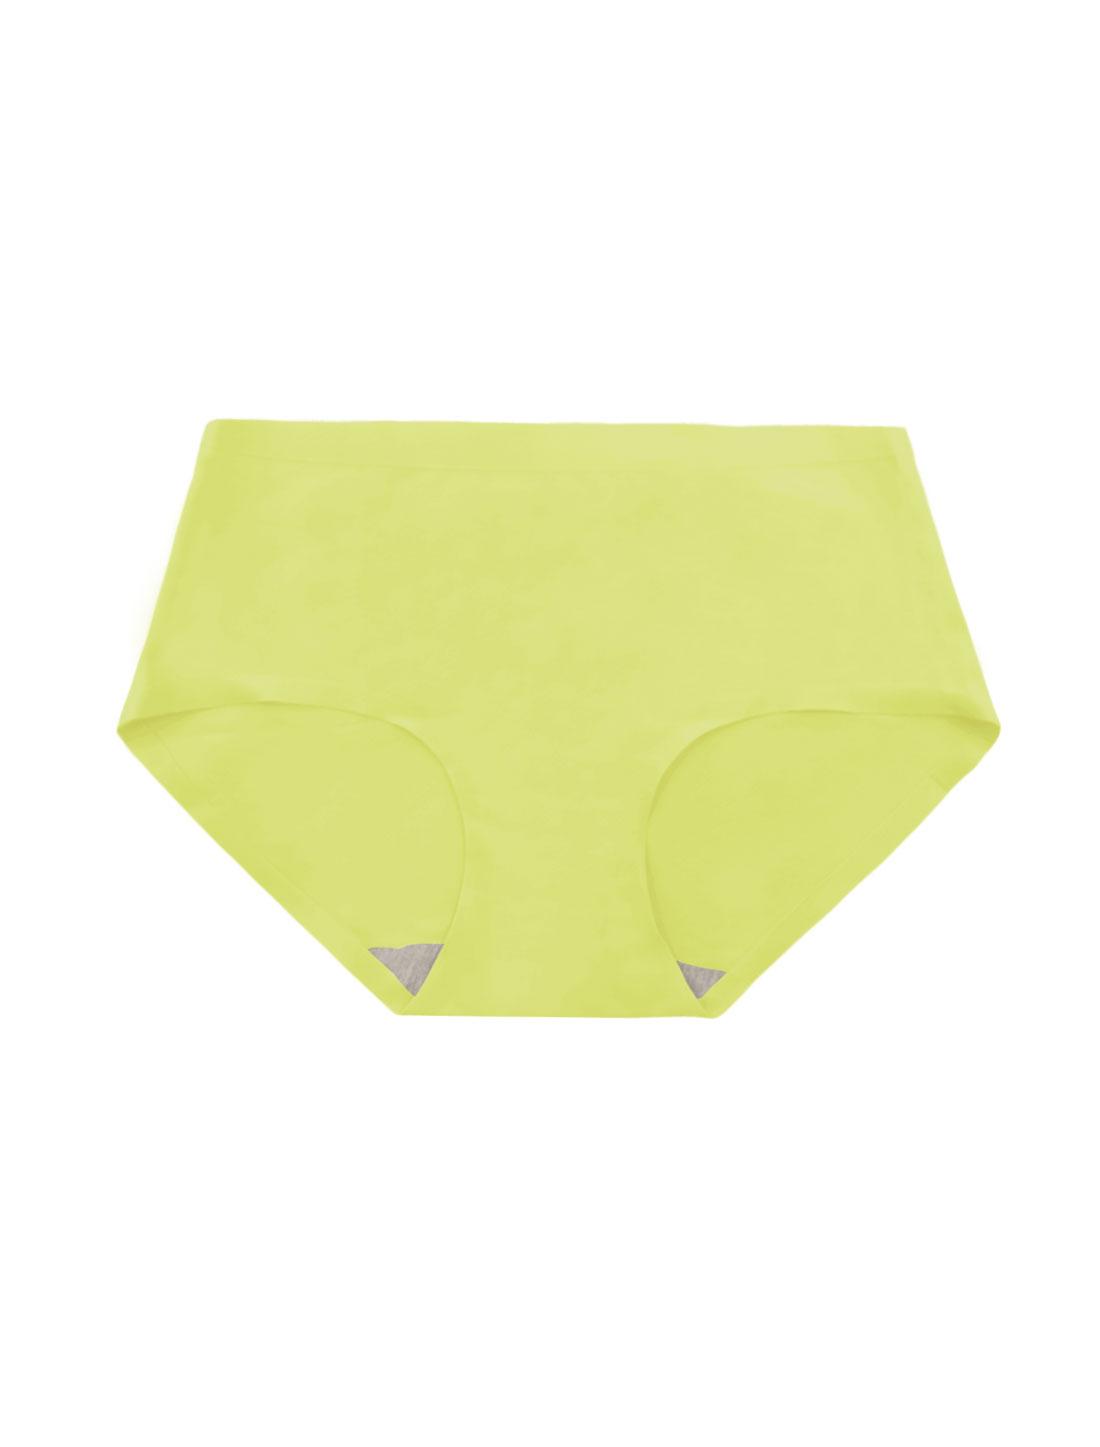 Women Mid Rise Elastic Waist Seamless Stretchy Panty Light Moss XS